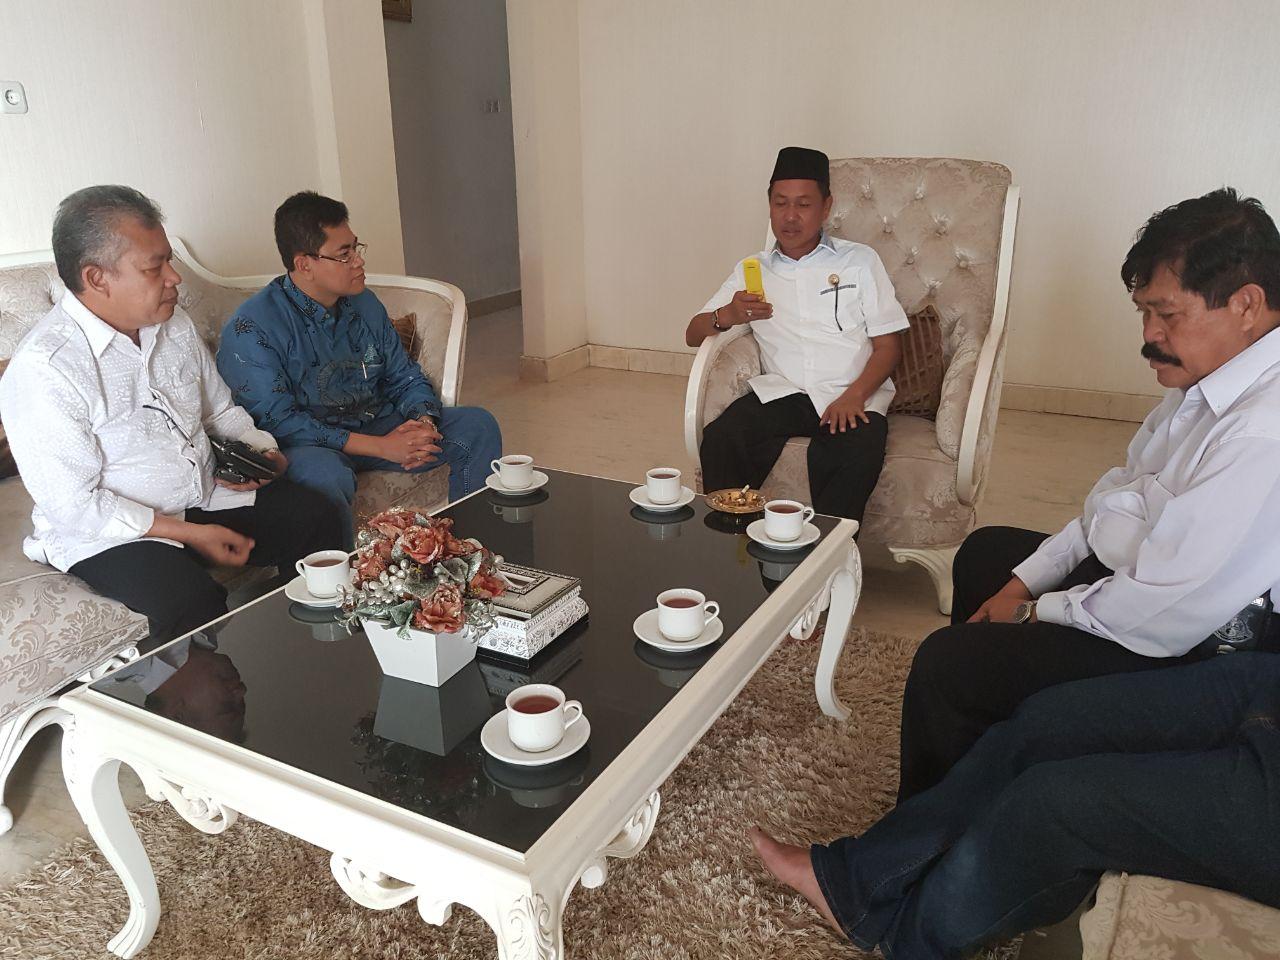 pangkep Bupati Syamsudin Hamid mitra tani cassava singkong investor welcome